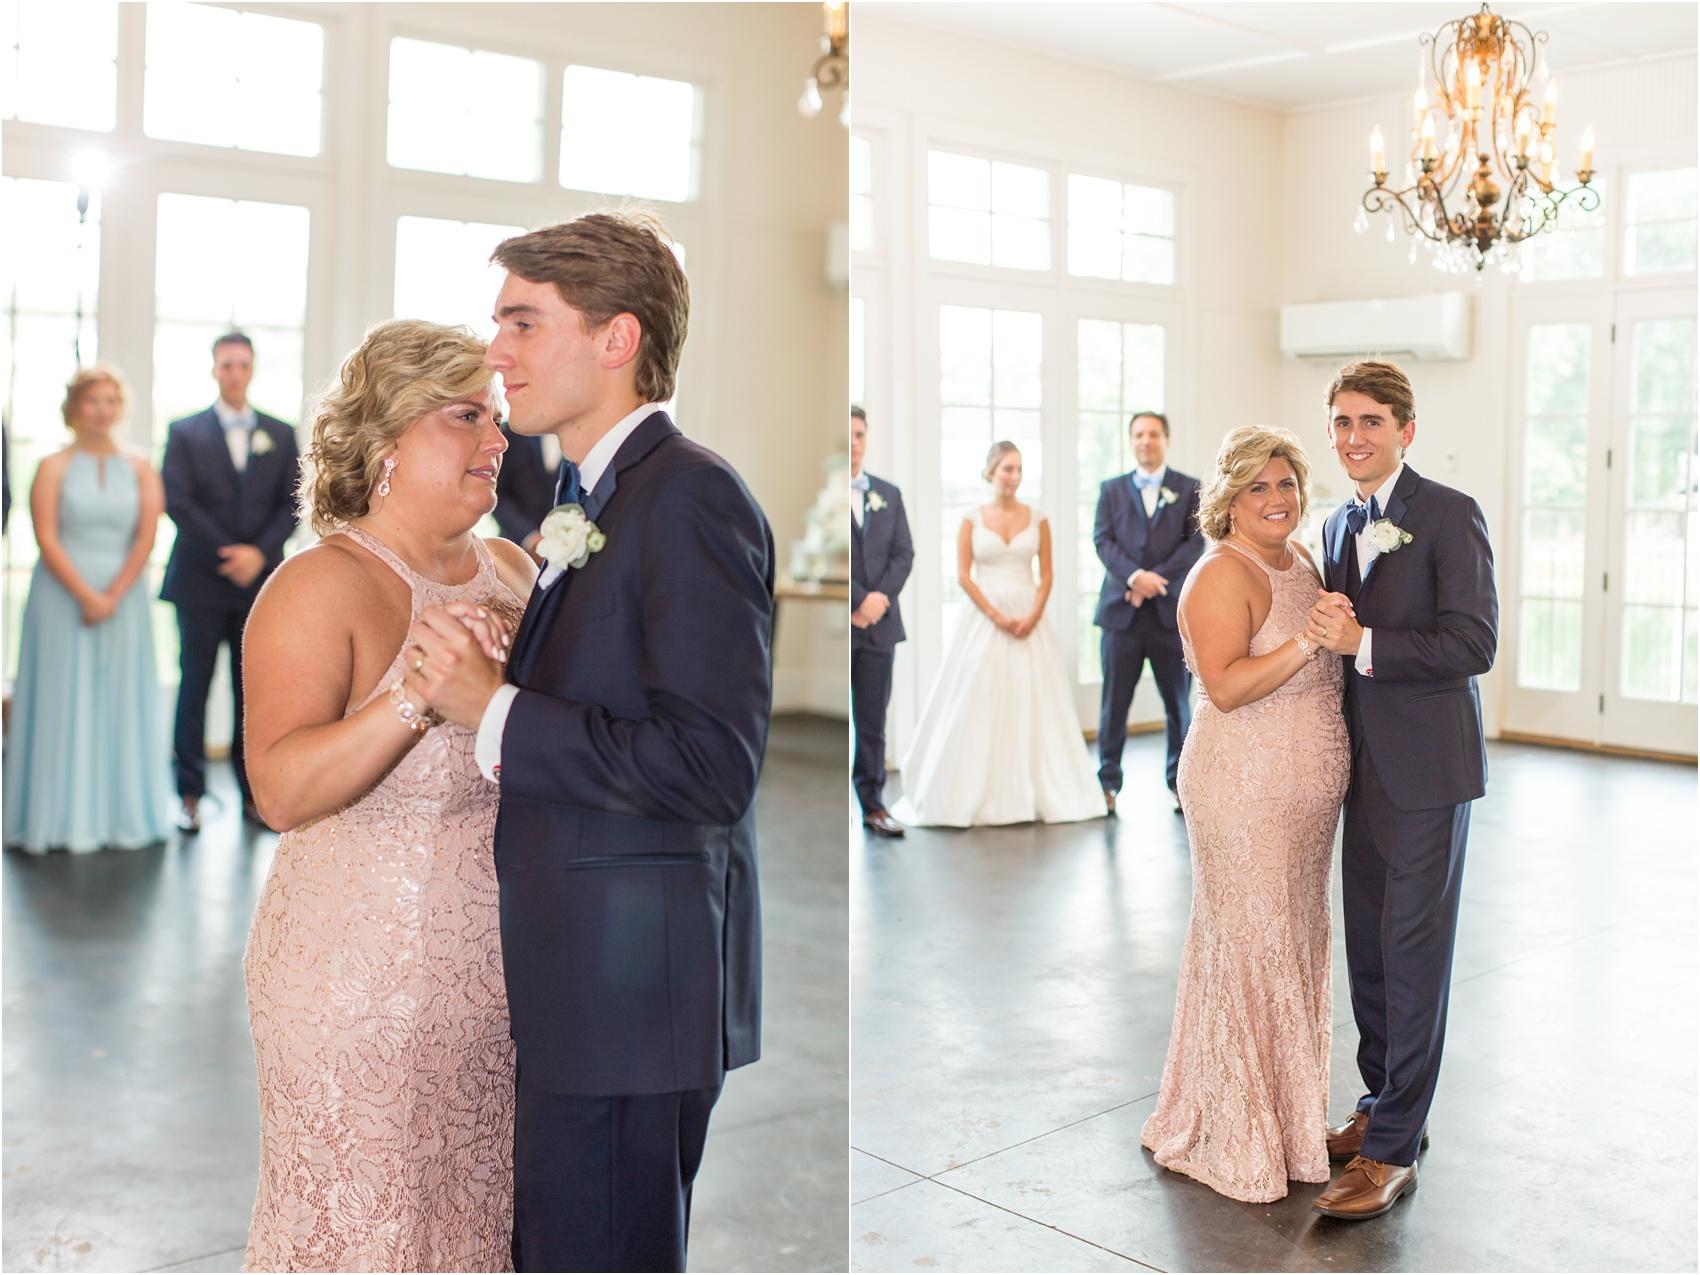 Savannah Eve Photography- Sigl-Adams Wedding- Sneak Peek-74.jpg